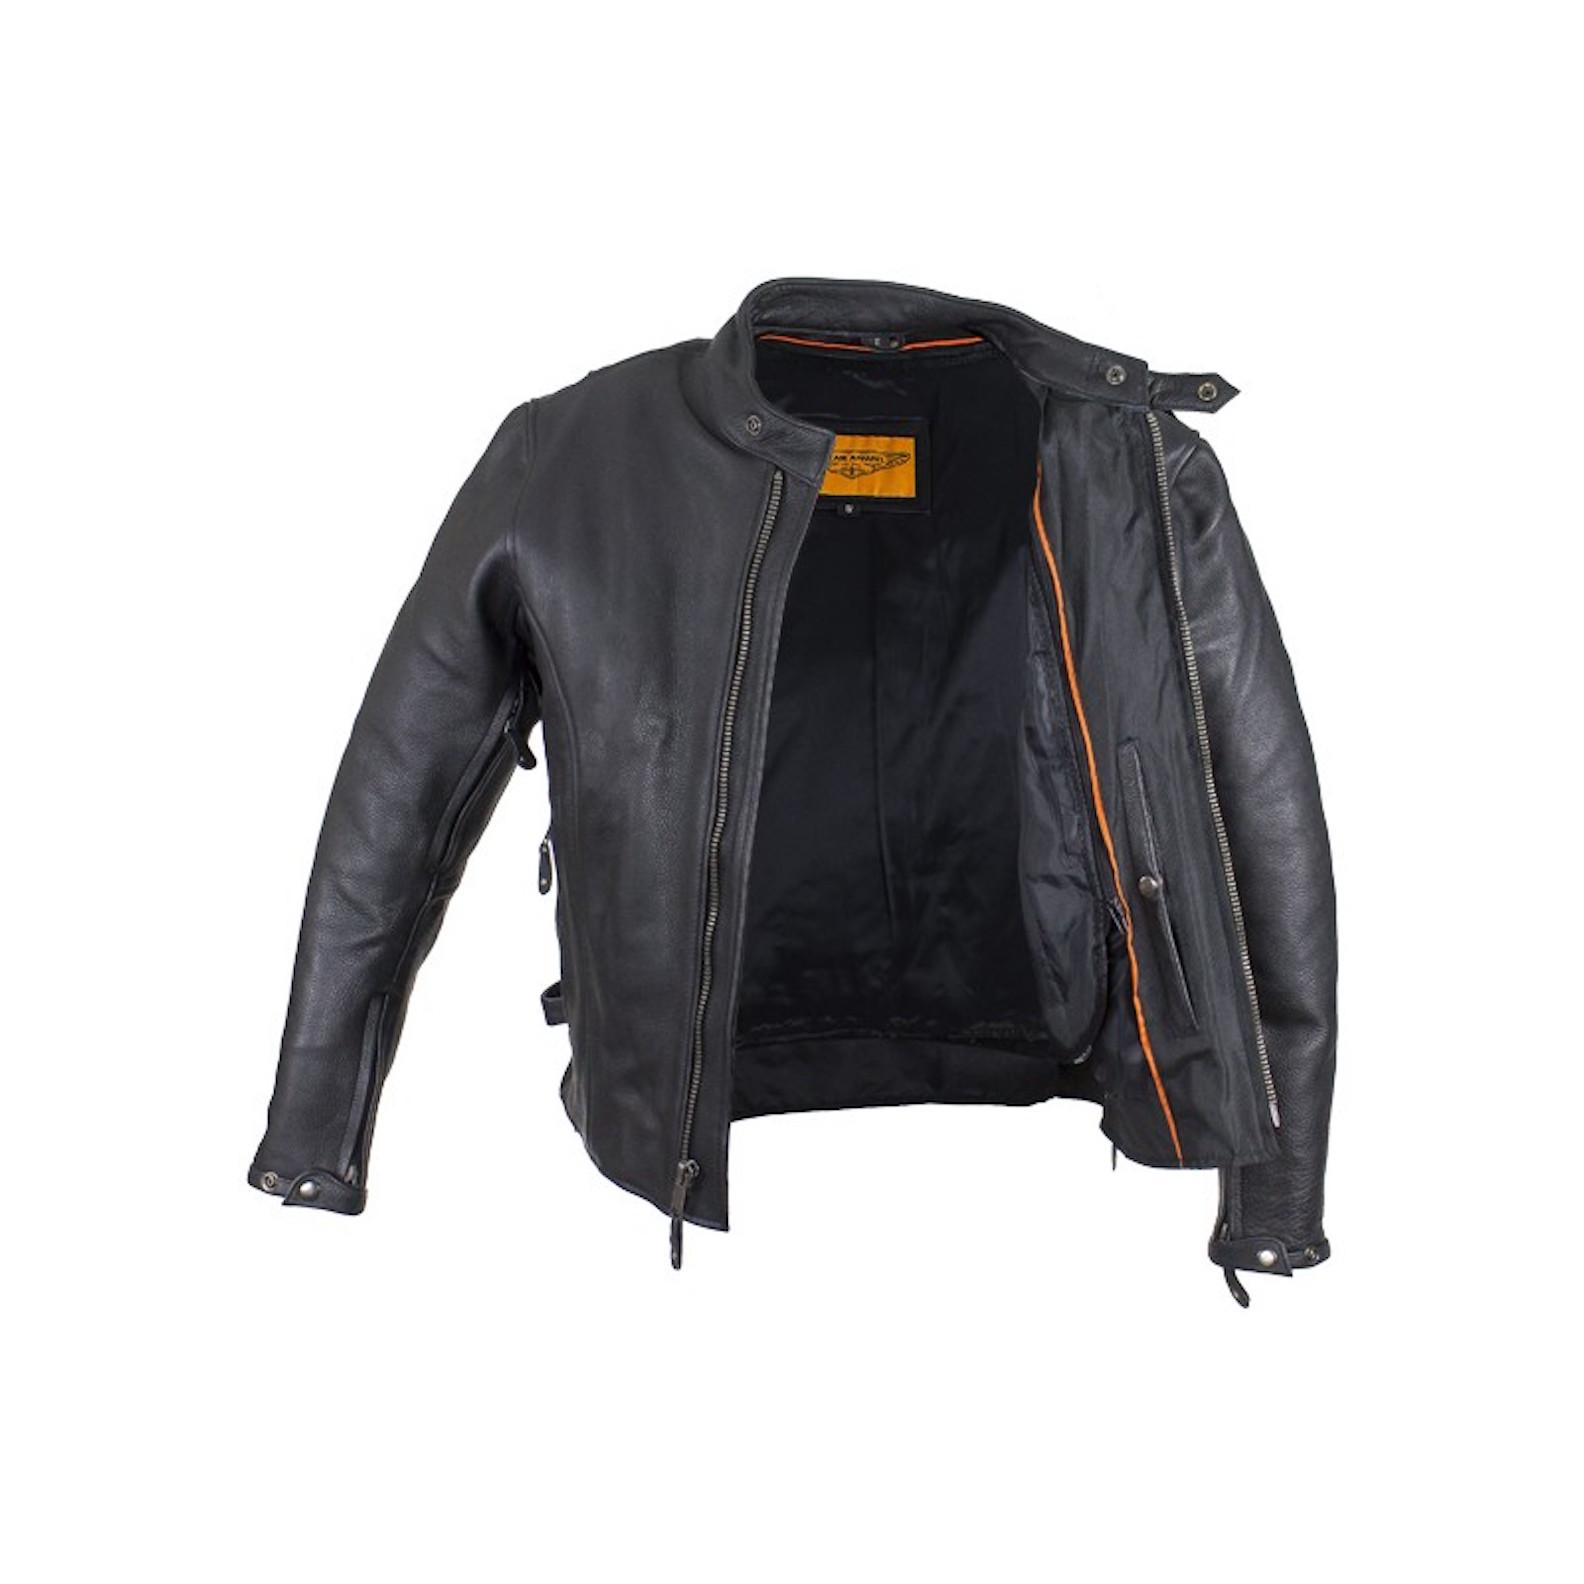 naked-leather-motorcycle-jacket-dickgirl-naked